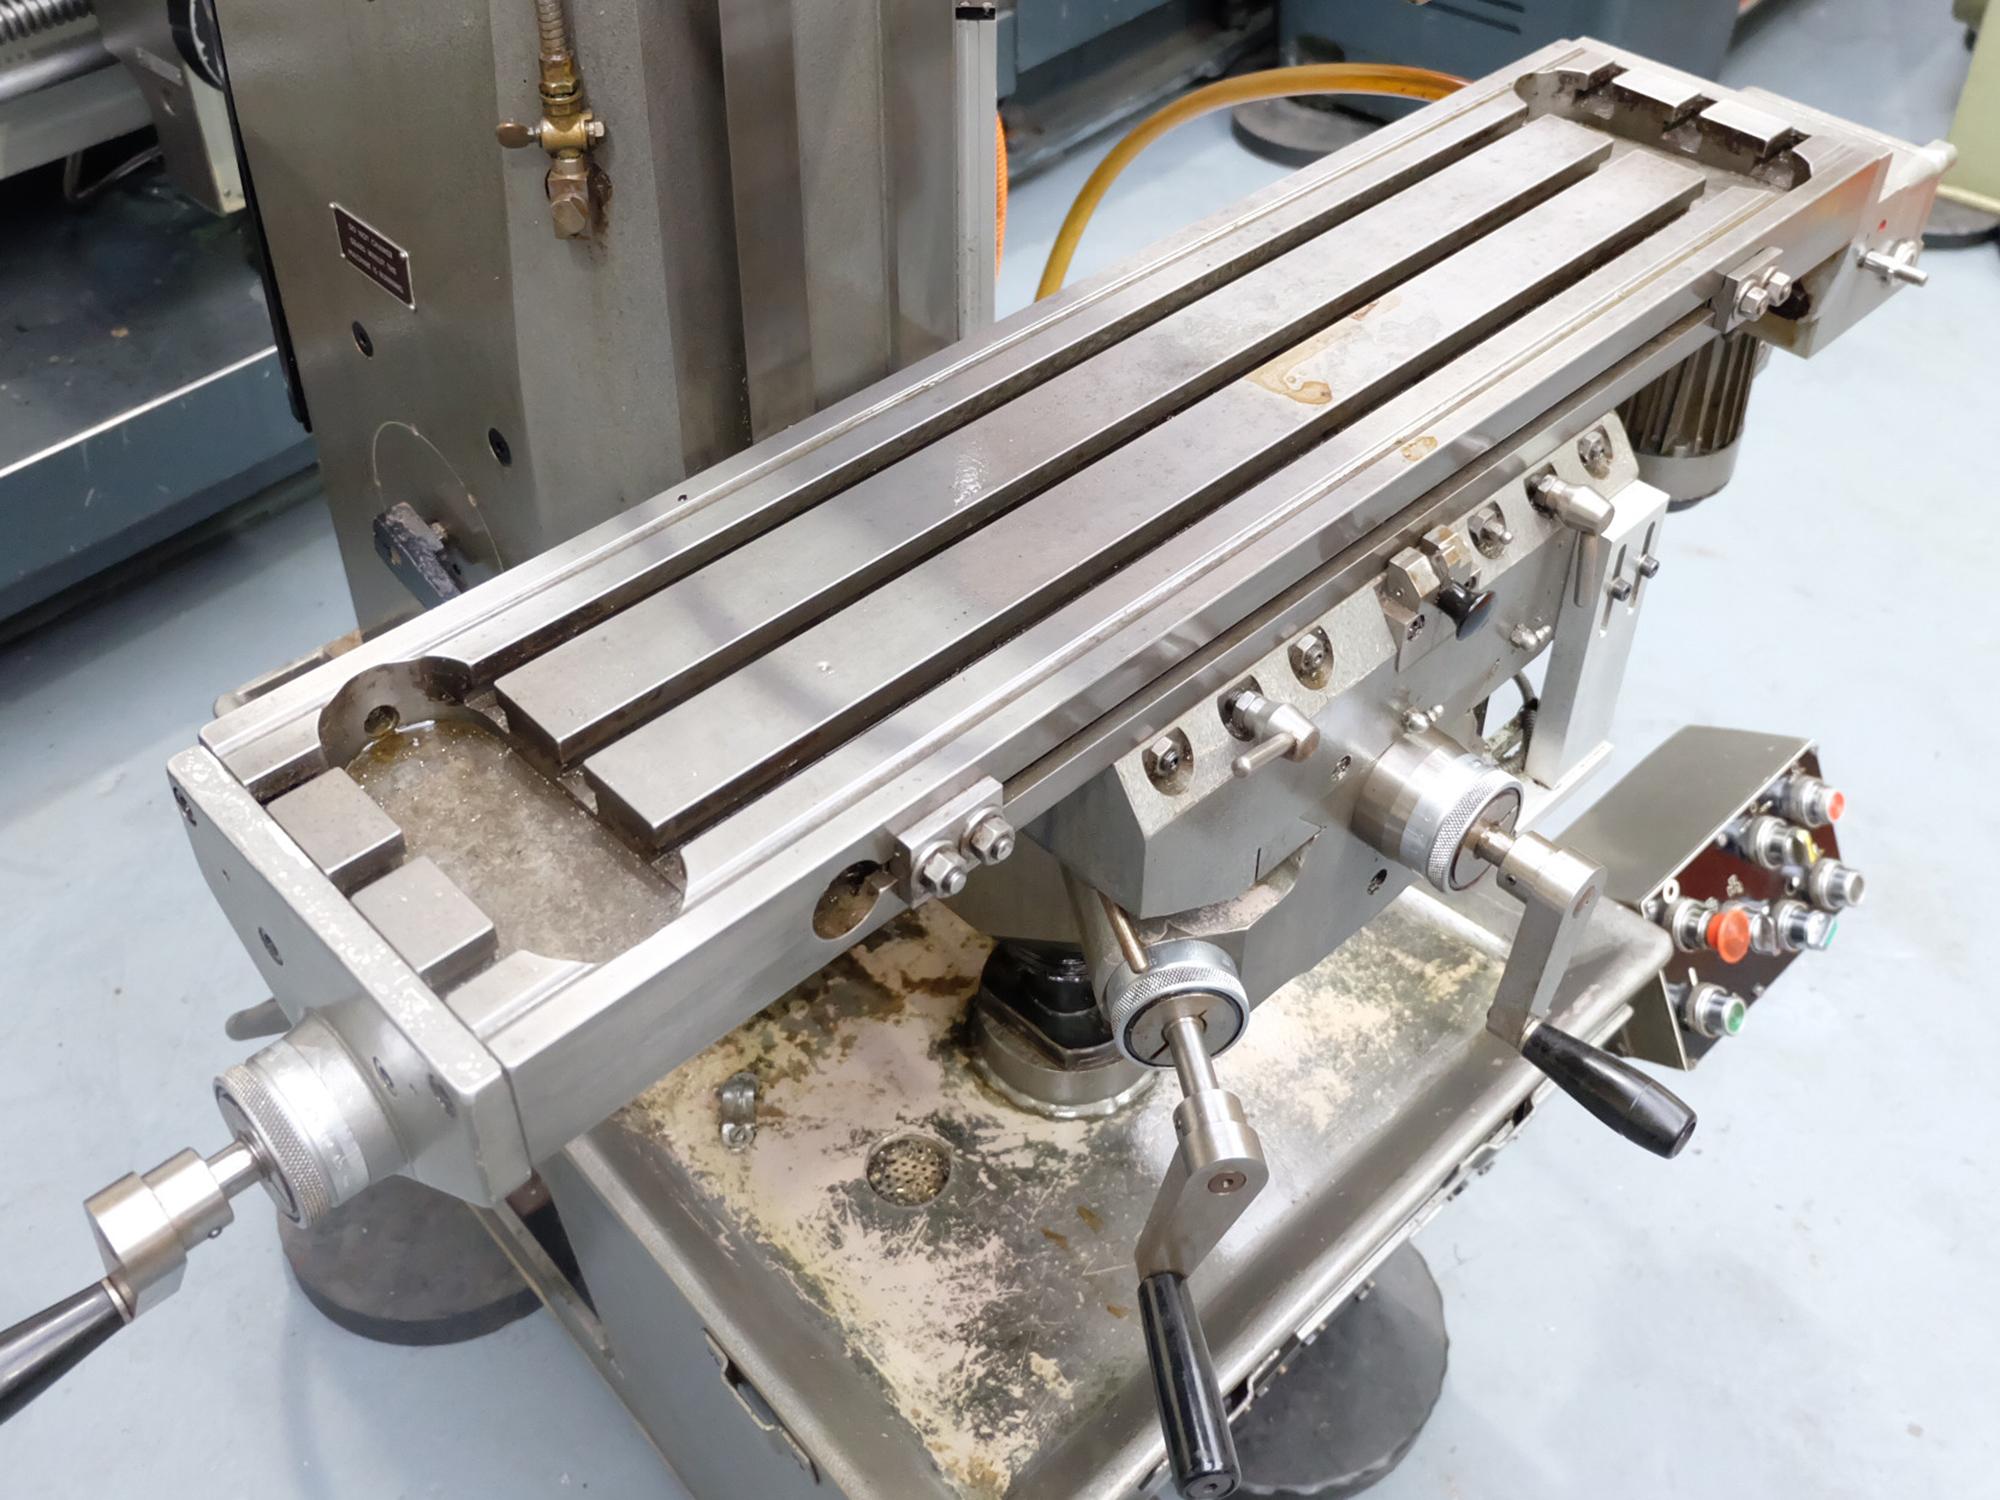 Veceroy AEW: Horizontal Milling Machine. - Image 5 of 10